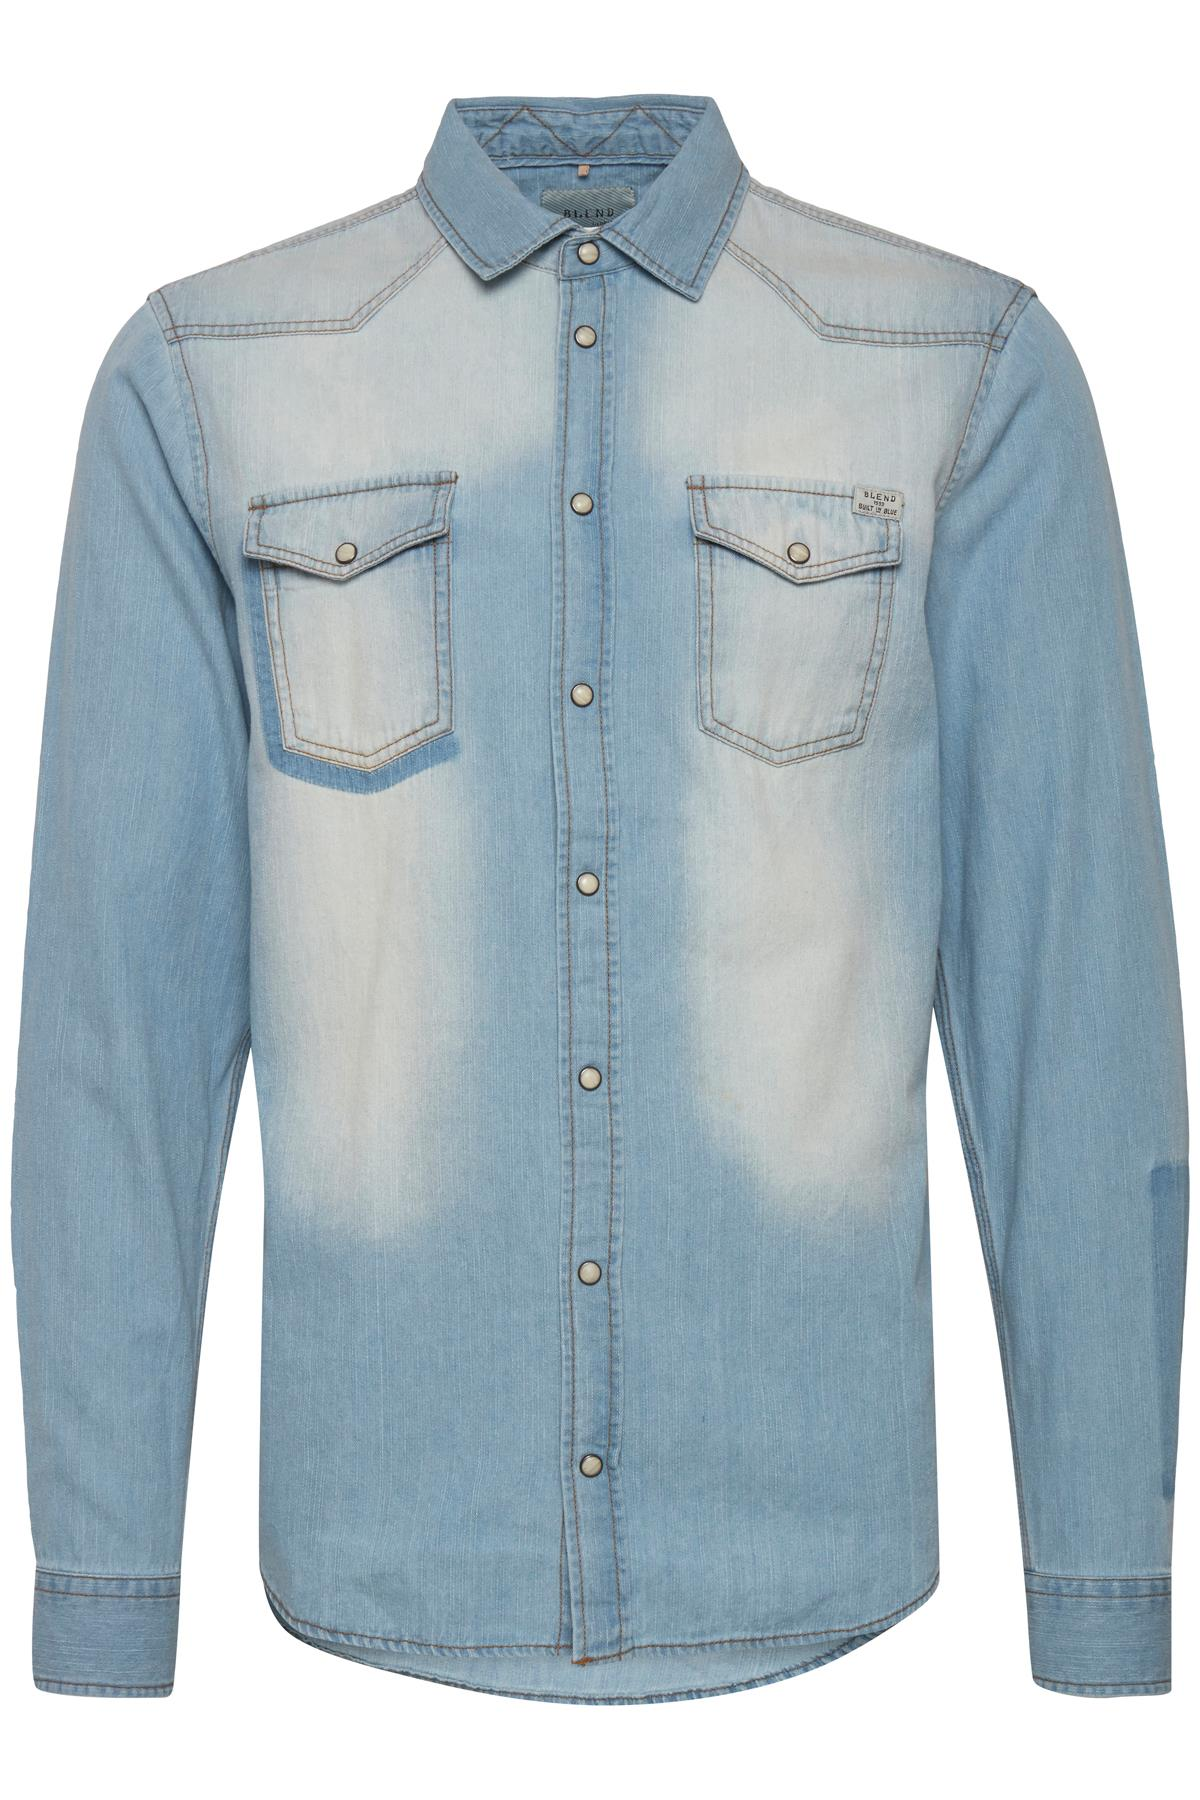 Navy Langærmet skjorte – Køb Navy Langærmet skjorte fra str. S-XXL her